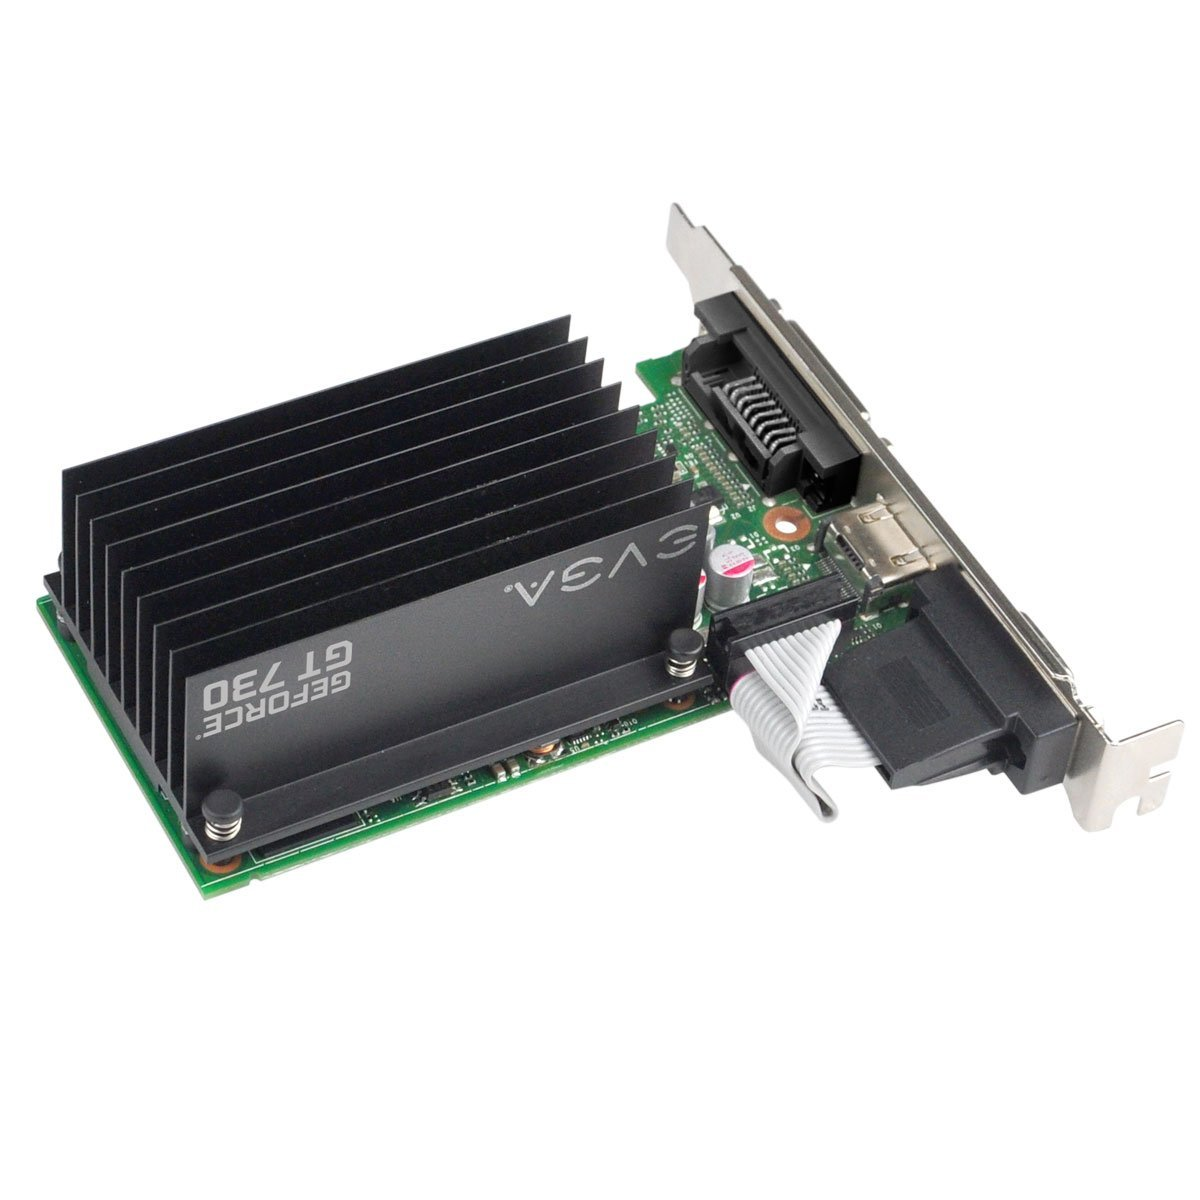 Placa de Vídeo Geforce GT730 1GB DDR3 64Bits 01G-P3-1731-KR - EVGA